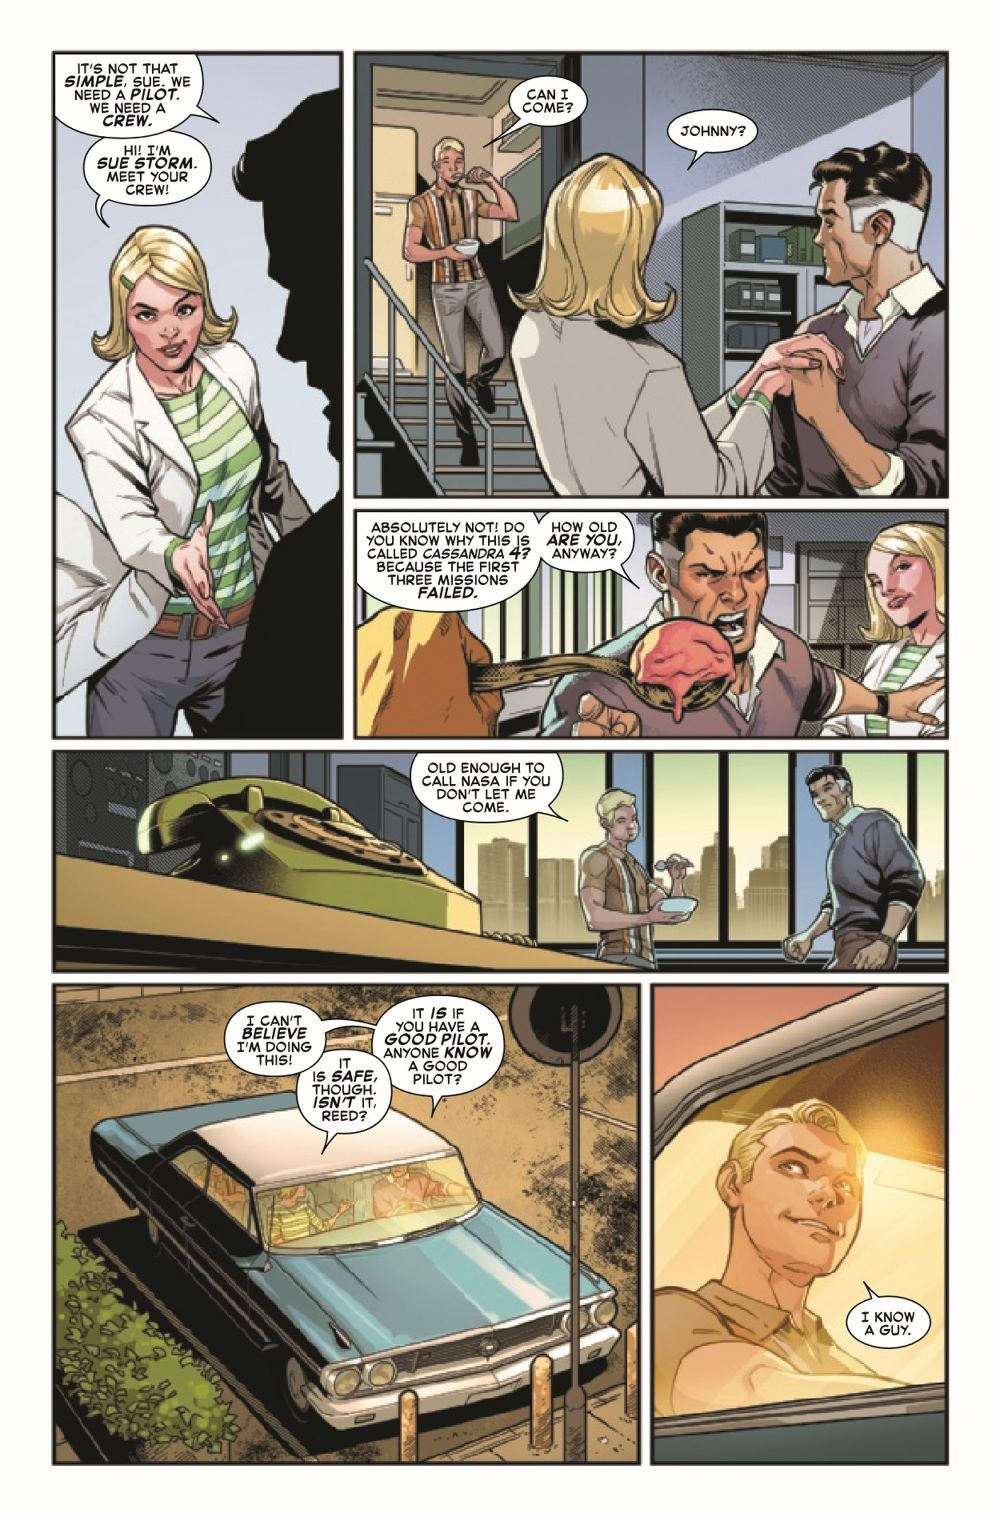 FFLIFESTORY2021001_Preview-3 ComicList Previews: FANTASTIC FOUR LIFE STORY #1 (OF 6)